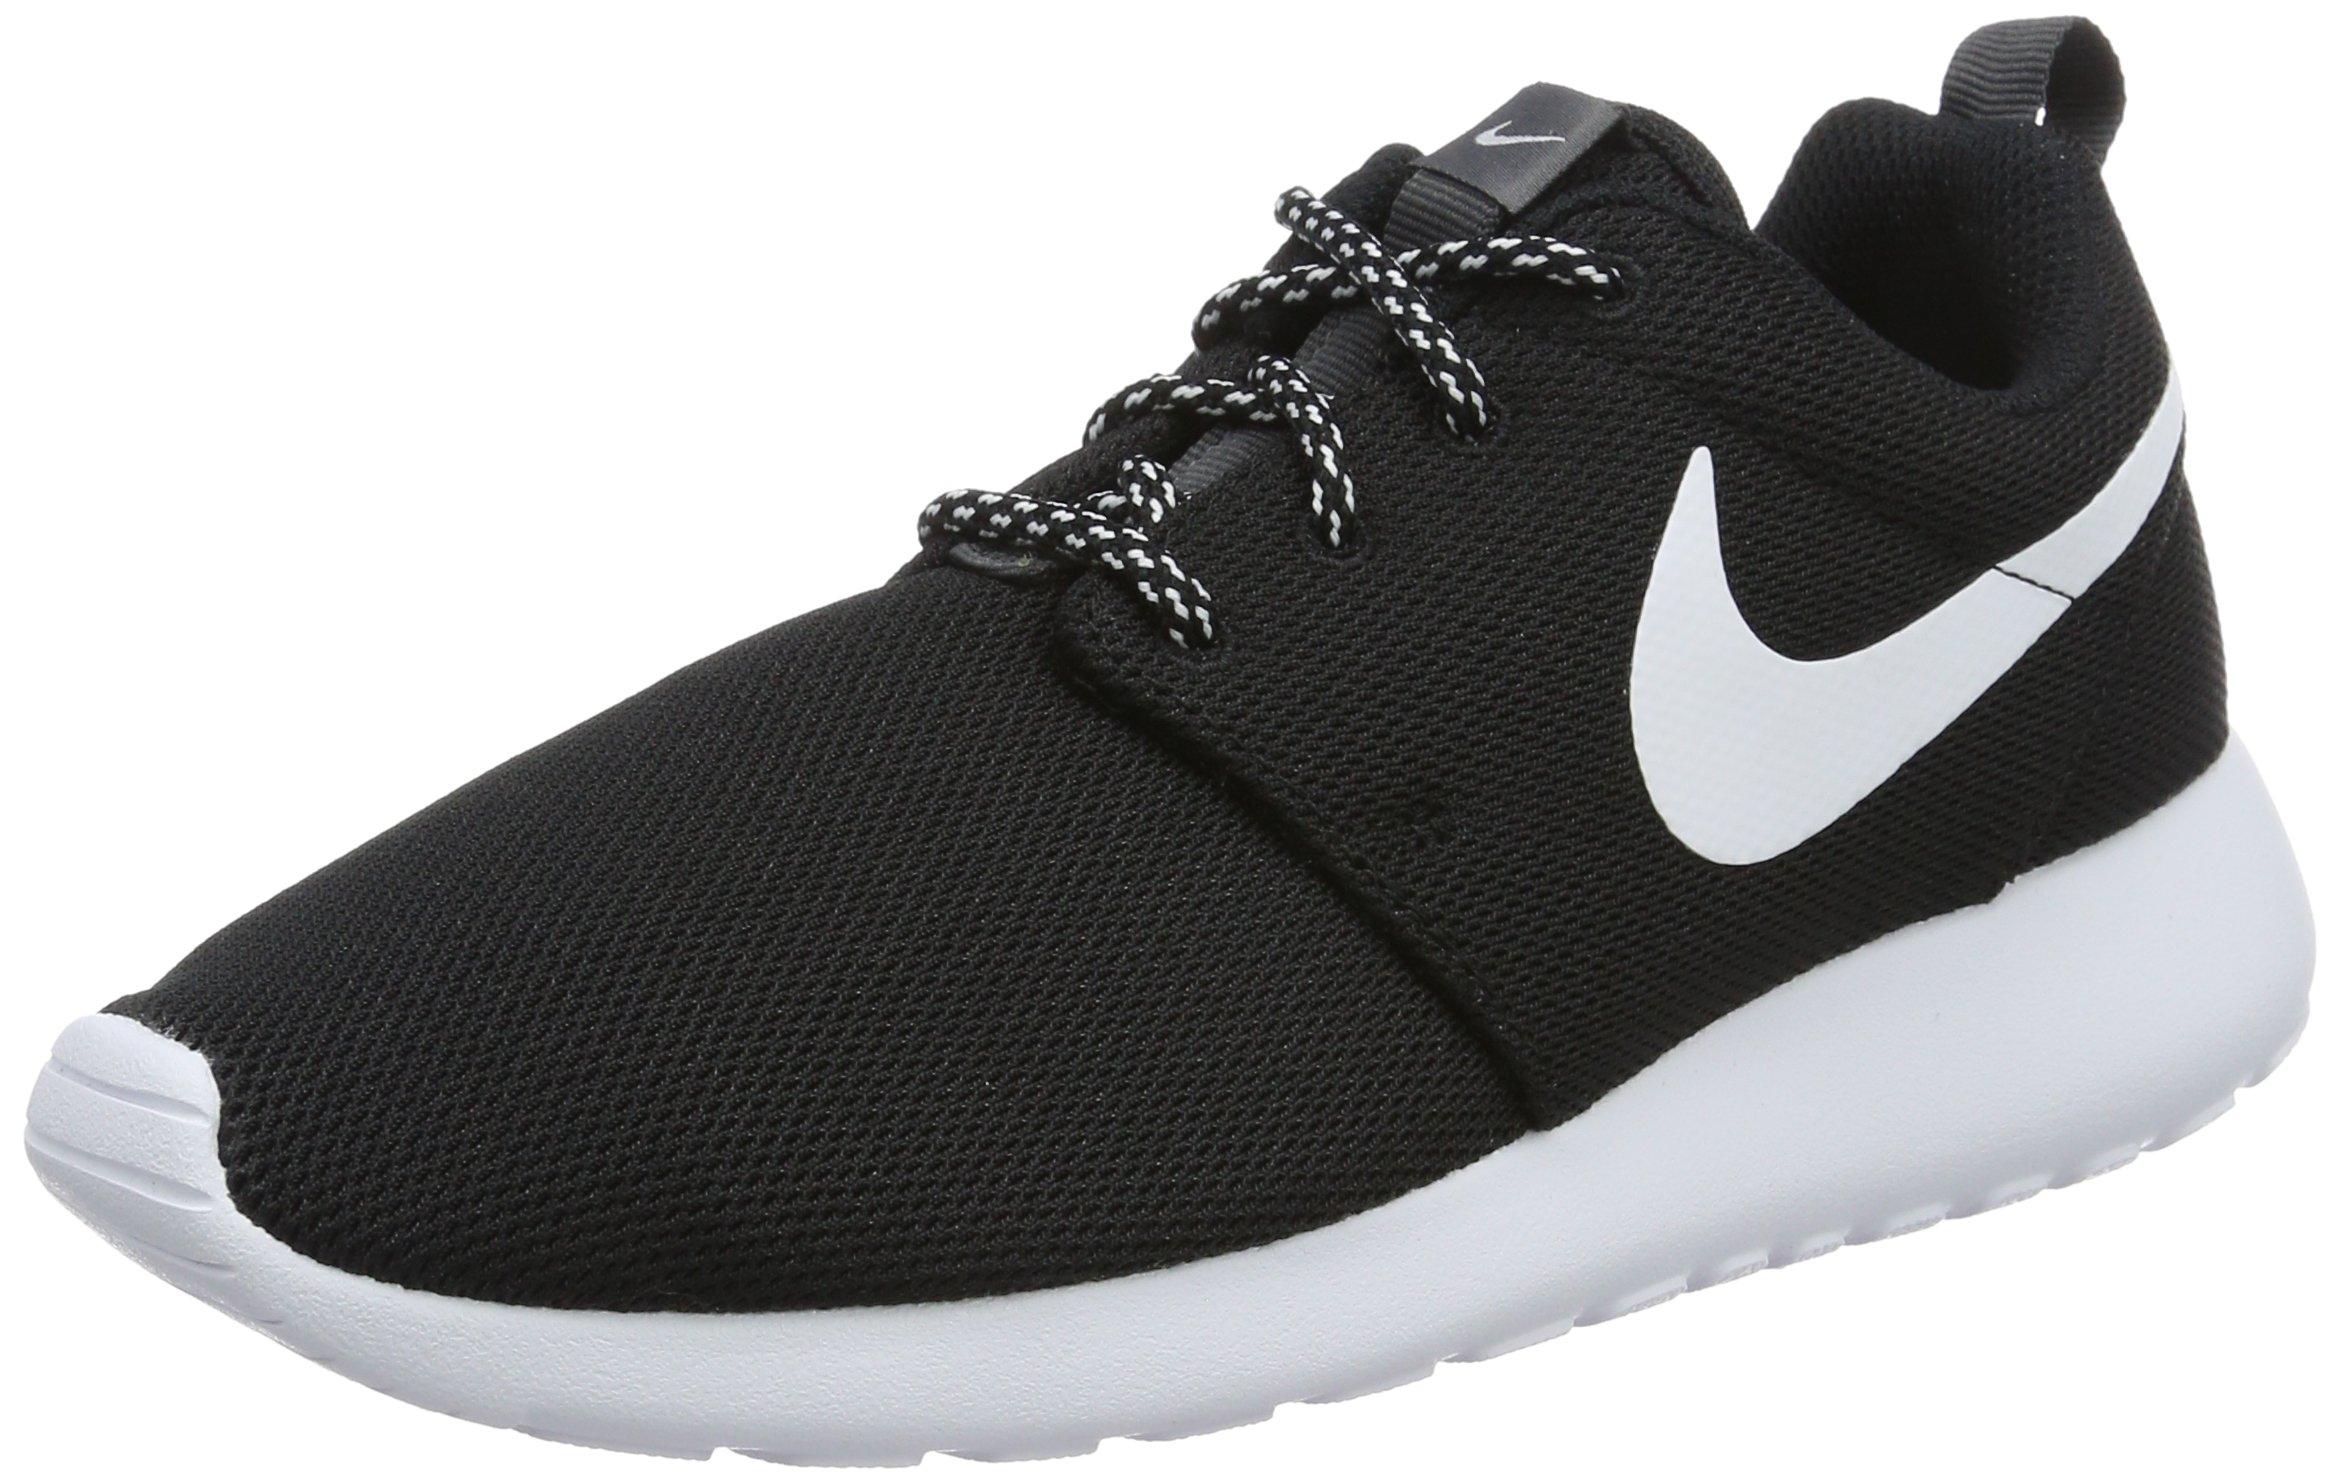 Nike W ROSHE ONE womens running-shoes 844994-002 BLACK/WHITE-DARK GREY 8